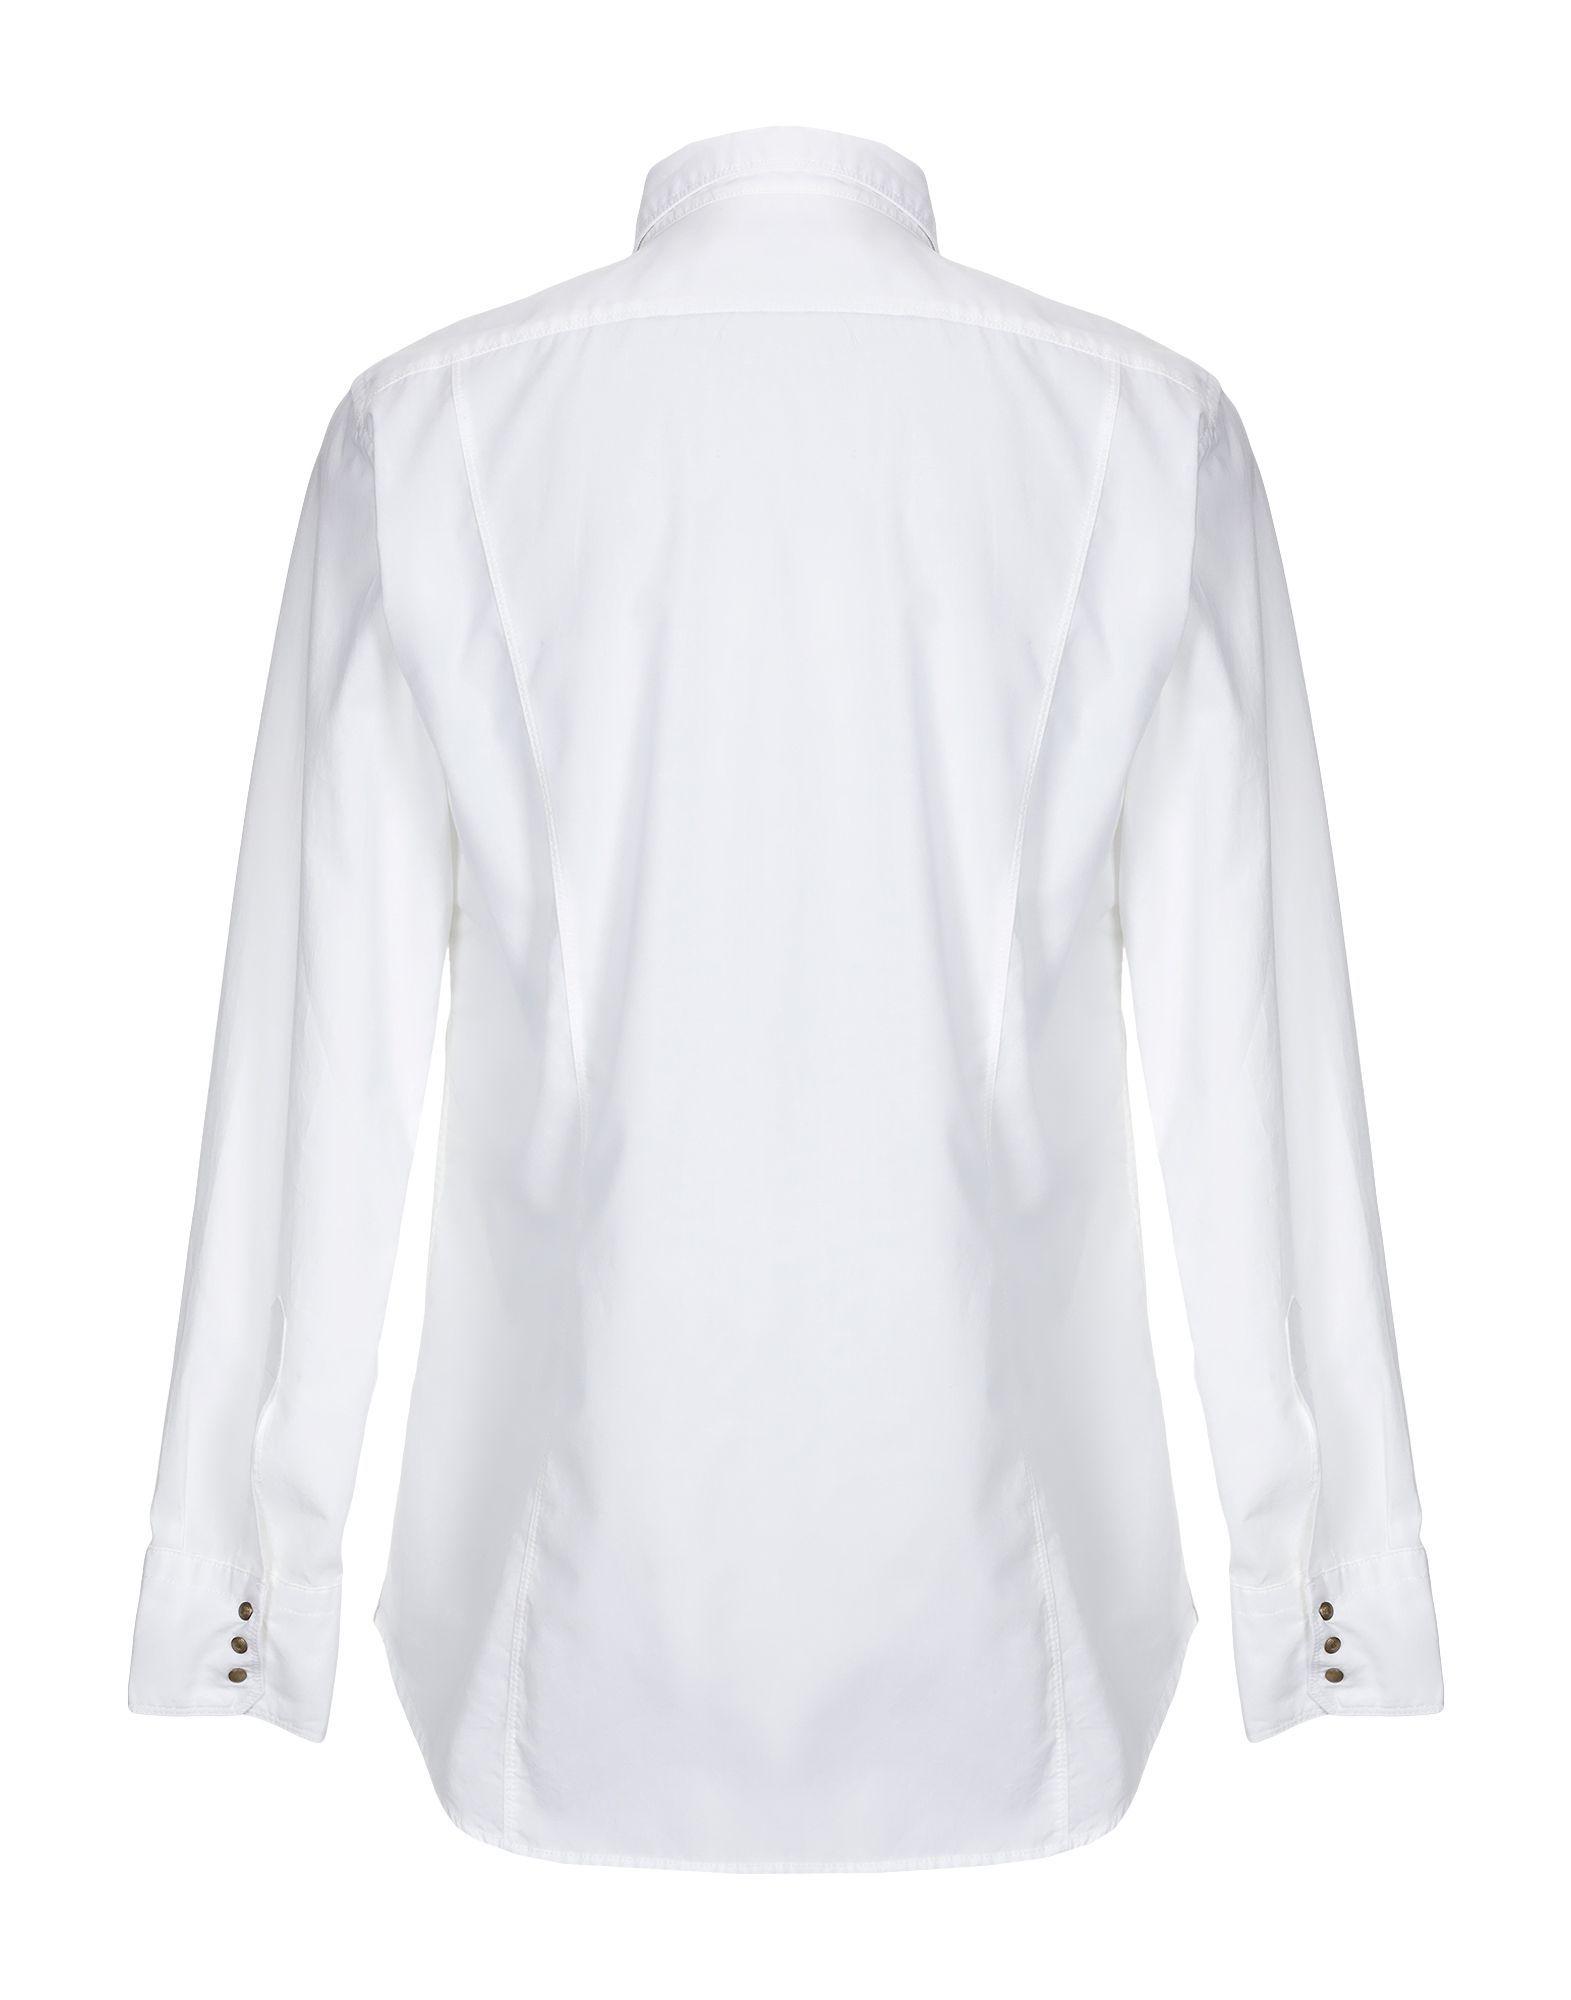 Messagerie White Cotton Shirt